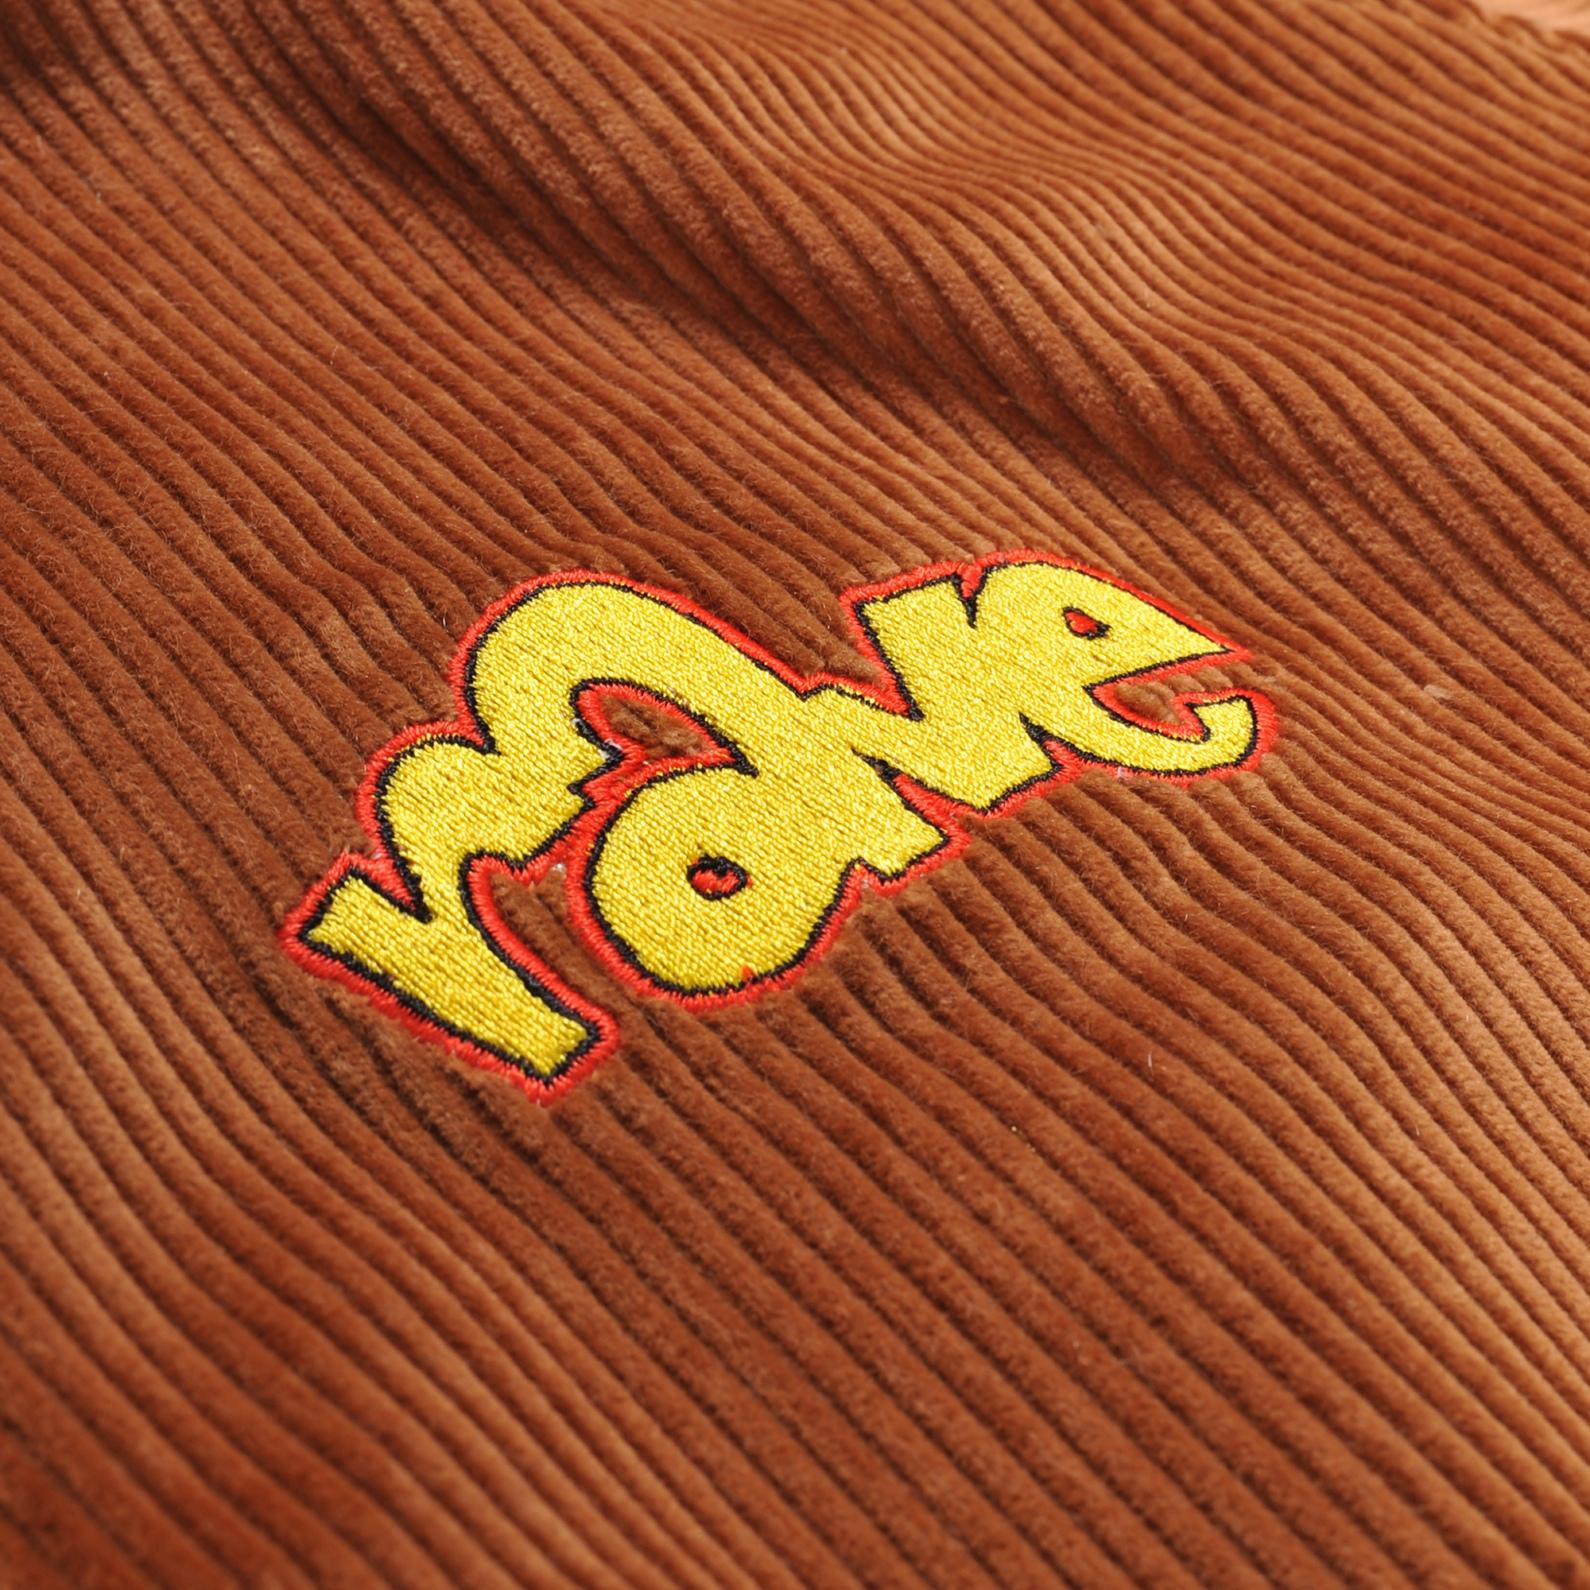 【RAVE SKATEBOARDS/レイブスケートボード】SPIKE CORDUROY REVERSIBLE  コーデュロイリバーシブルジャケット / CAMEL